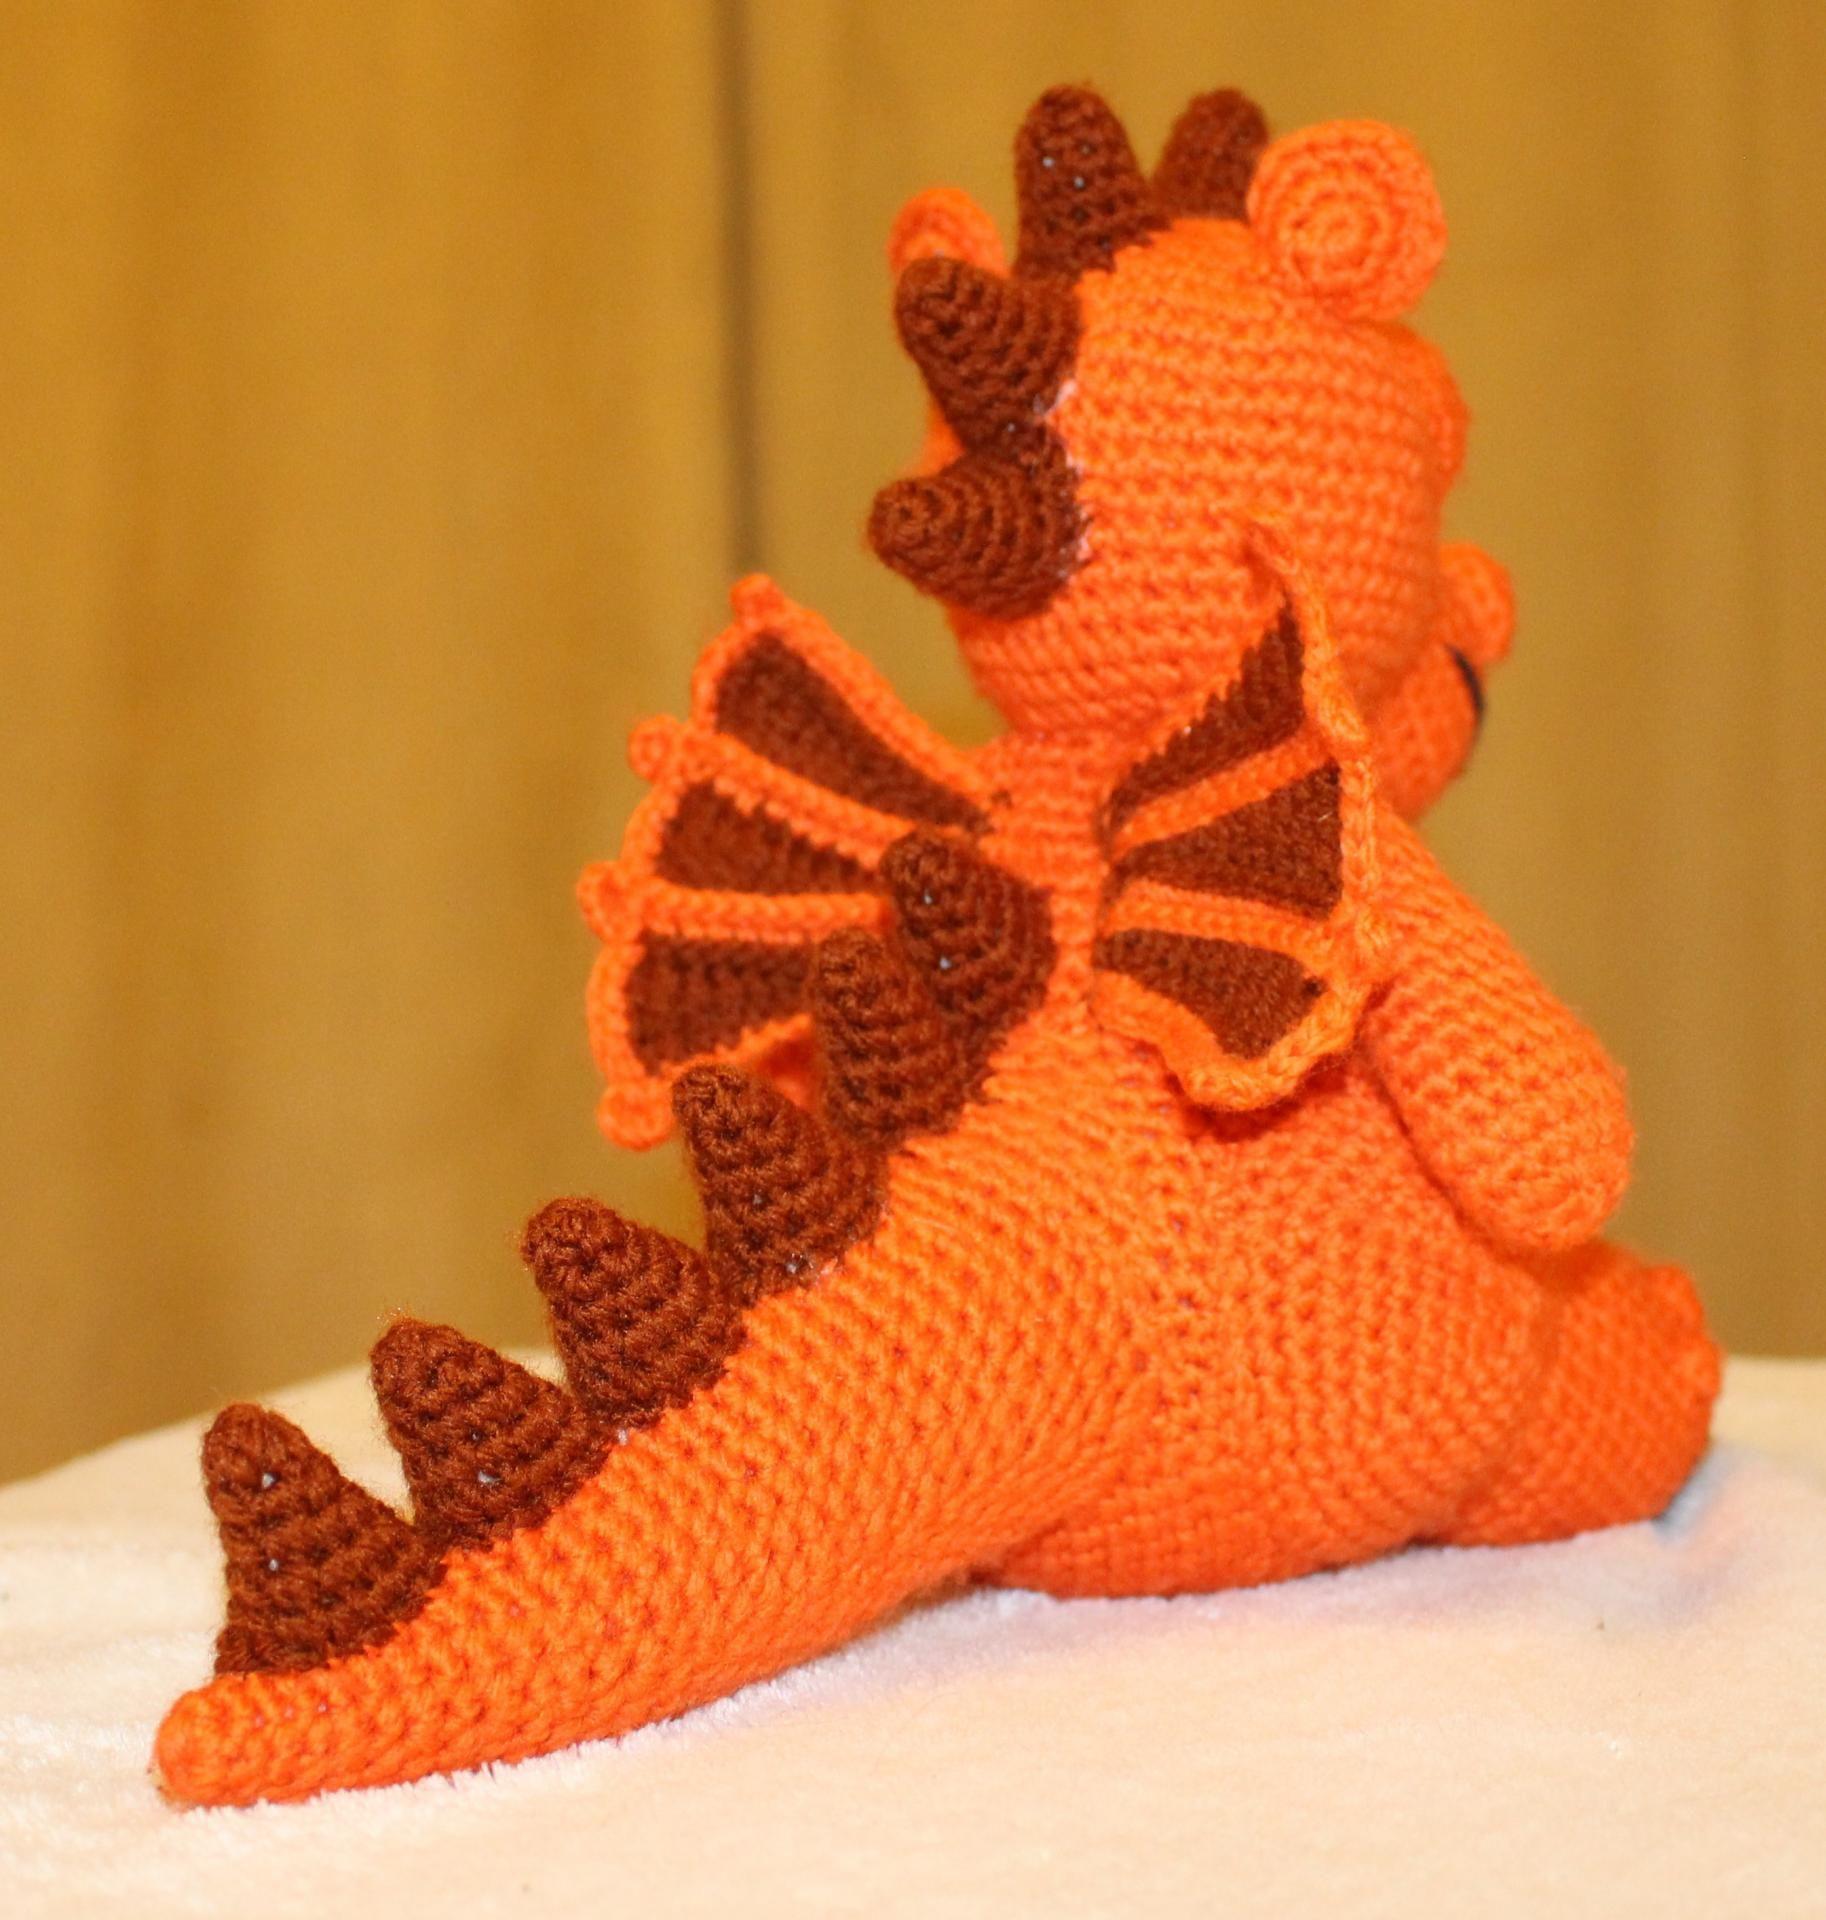 Petites Filles Patron Crochet Amigurumi (French Edition) eBook ... | 1920x1826